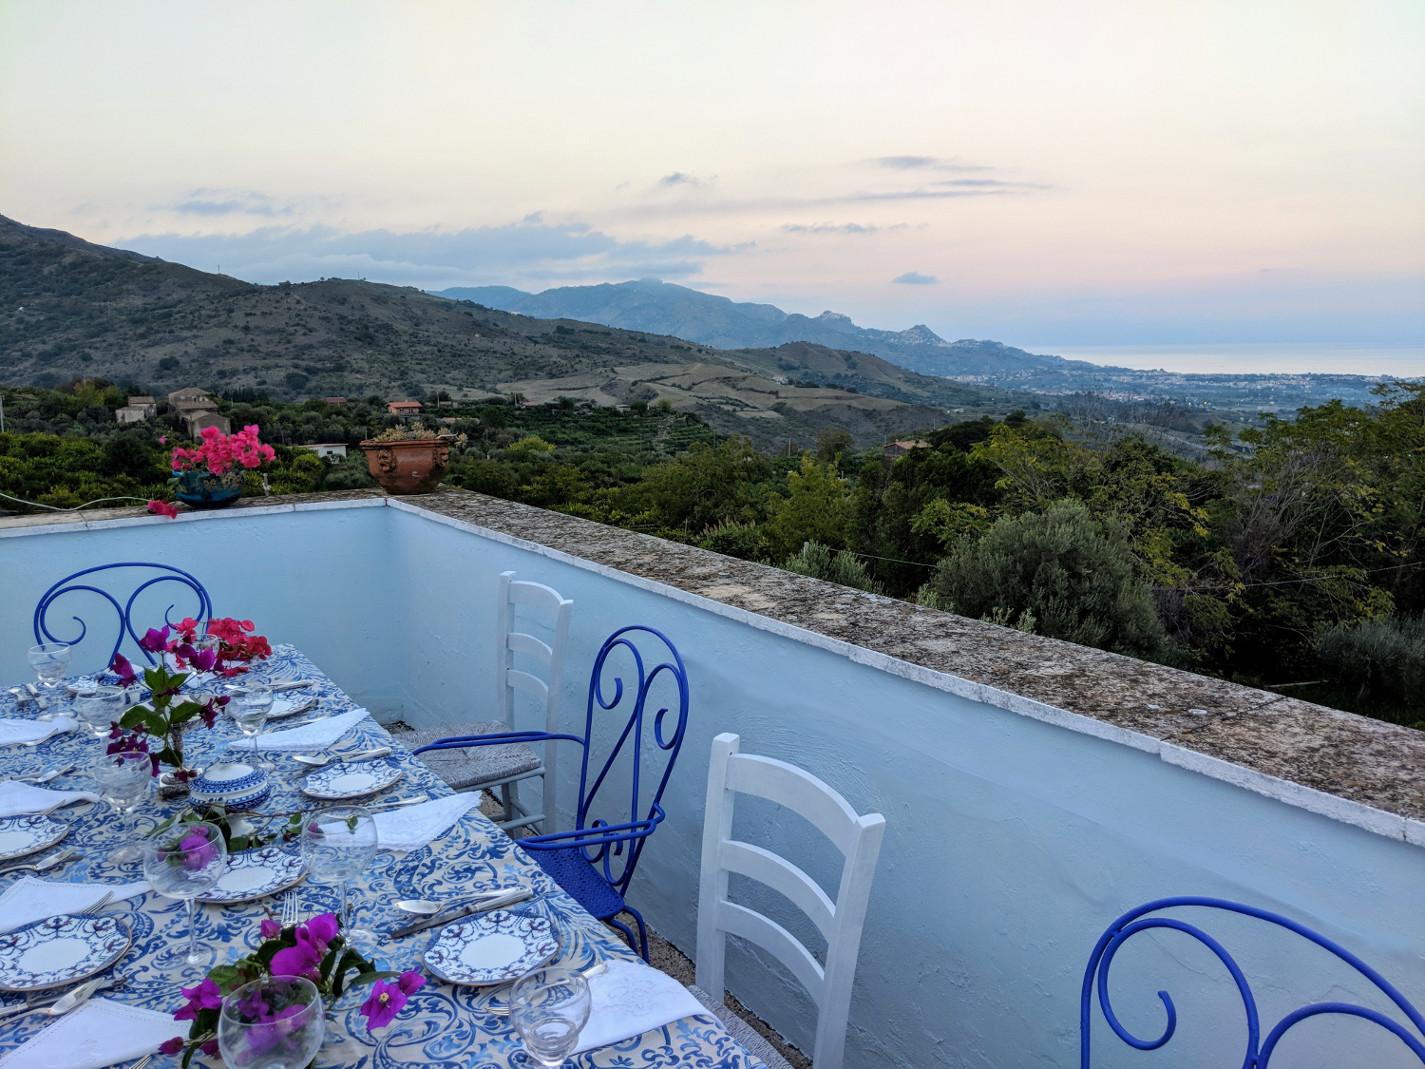 20 roof terrace villa ama sicily.jpg